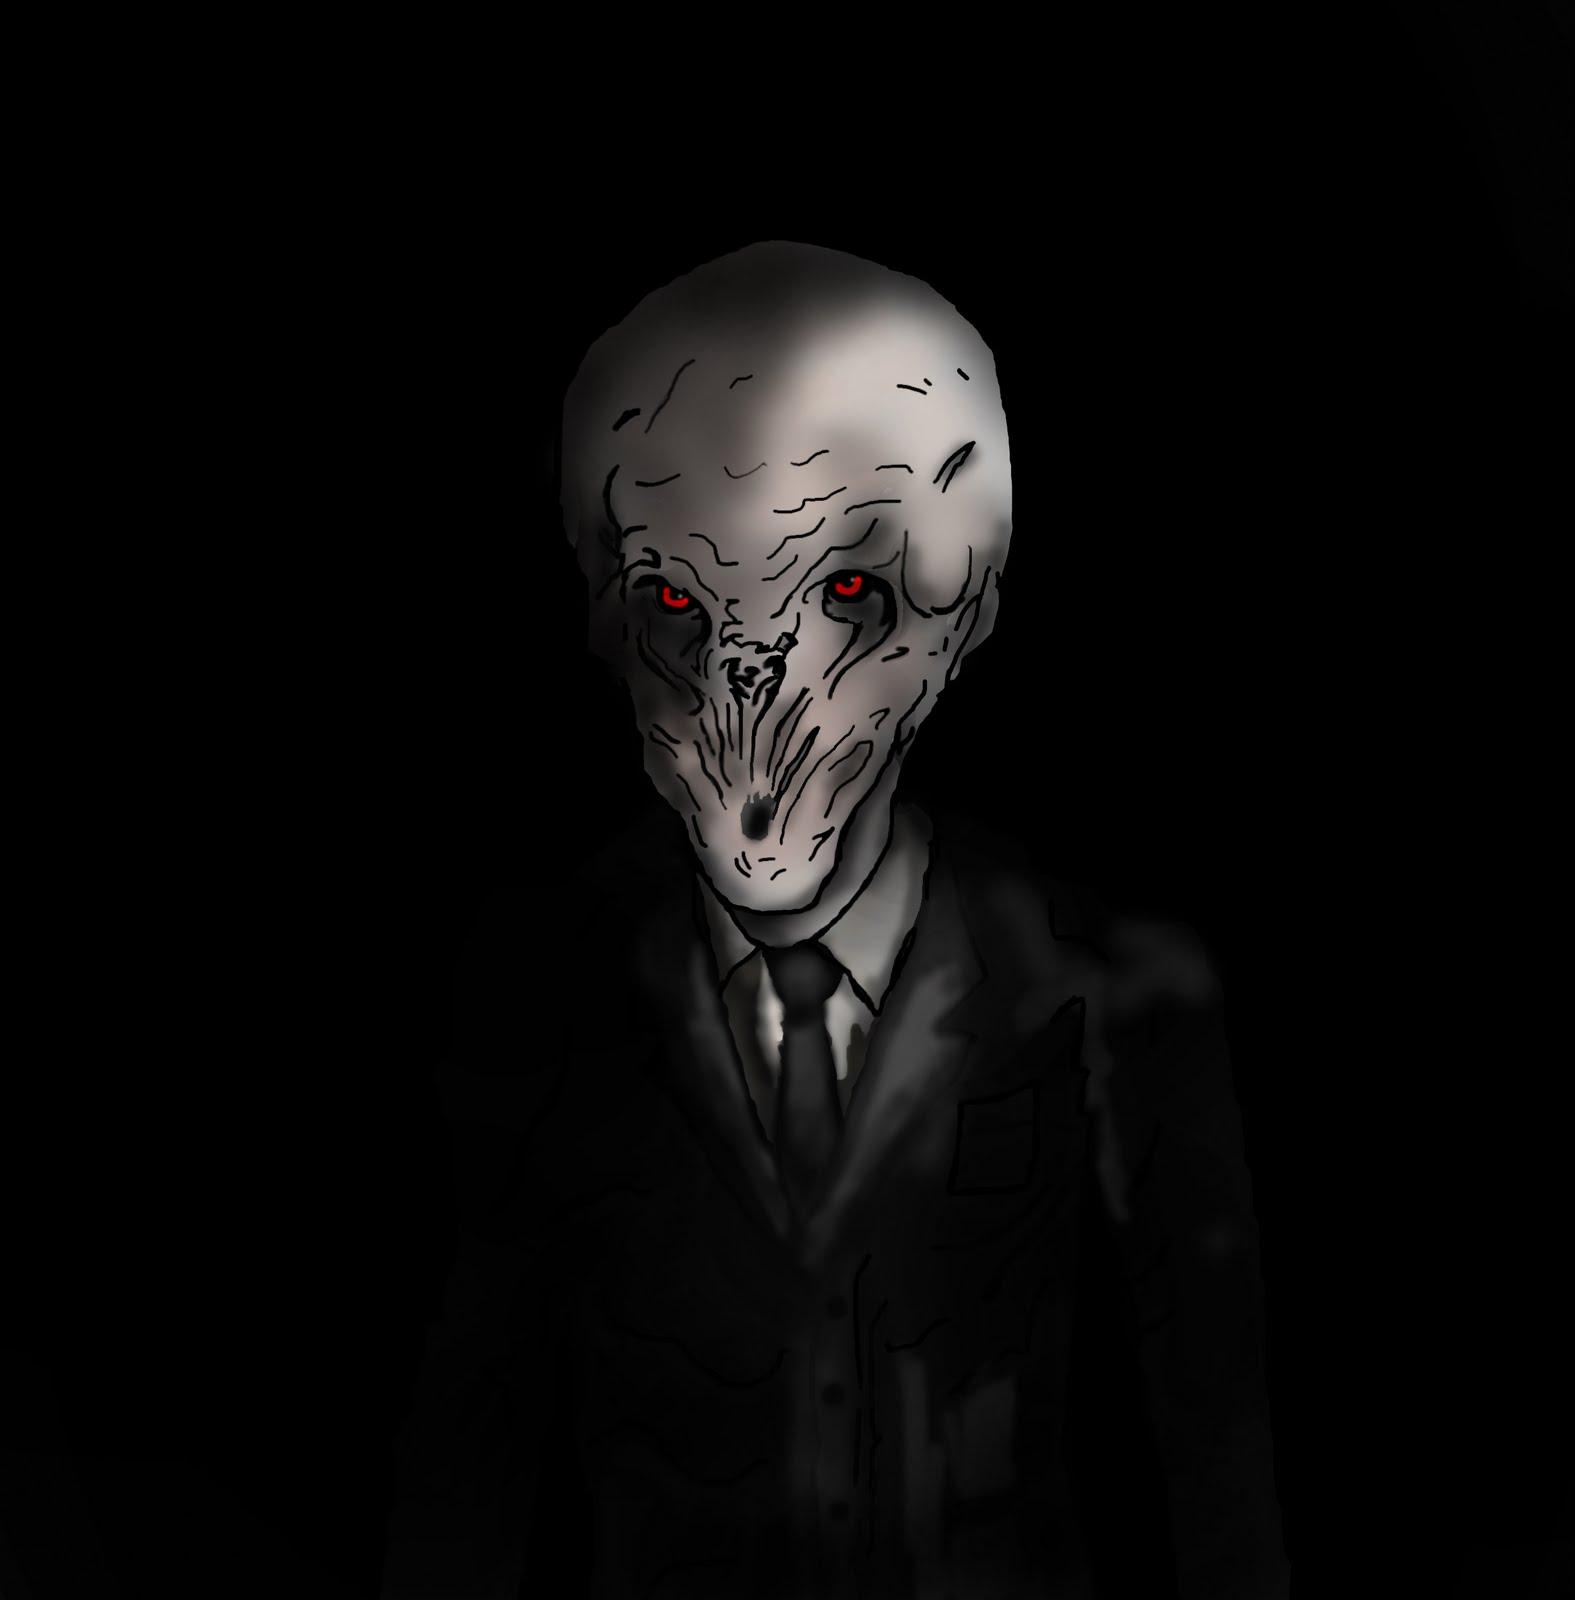 Creepy Monster Drawings This creepy new monster